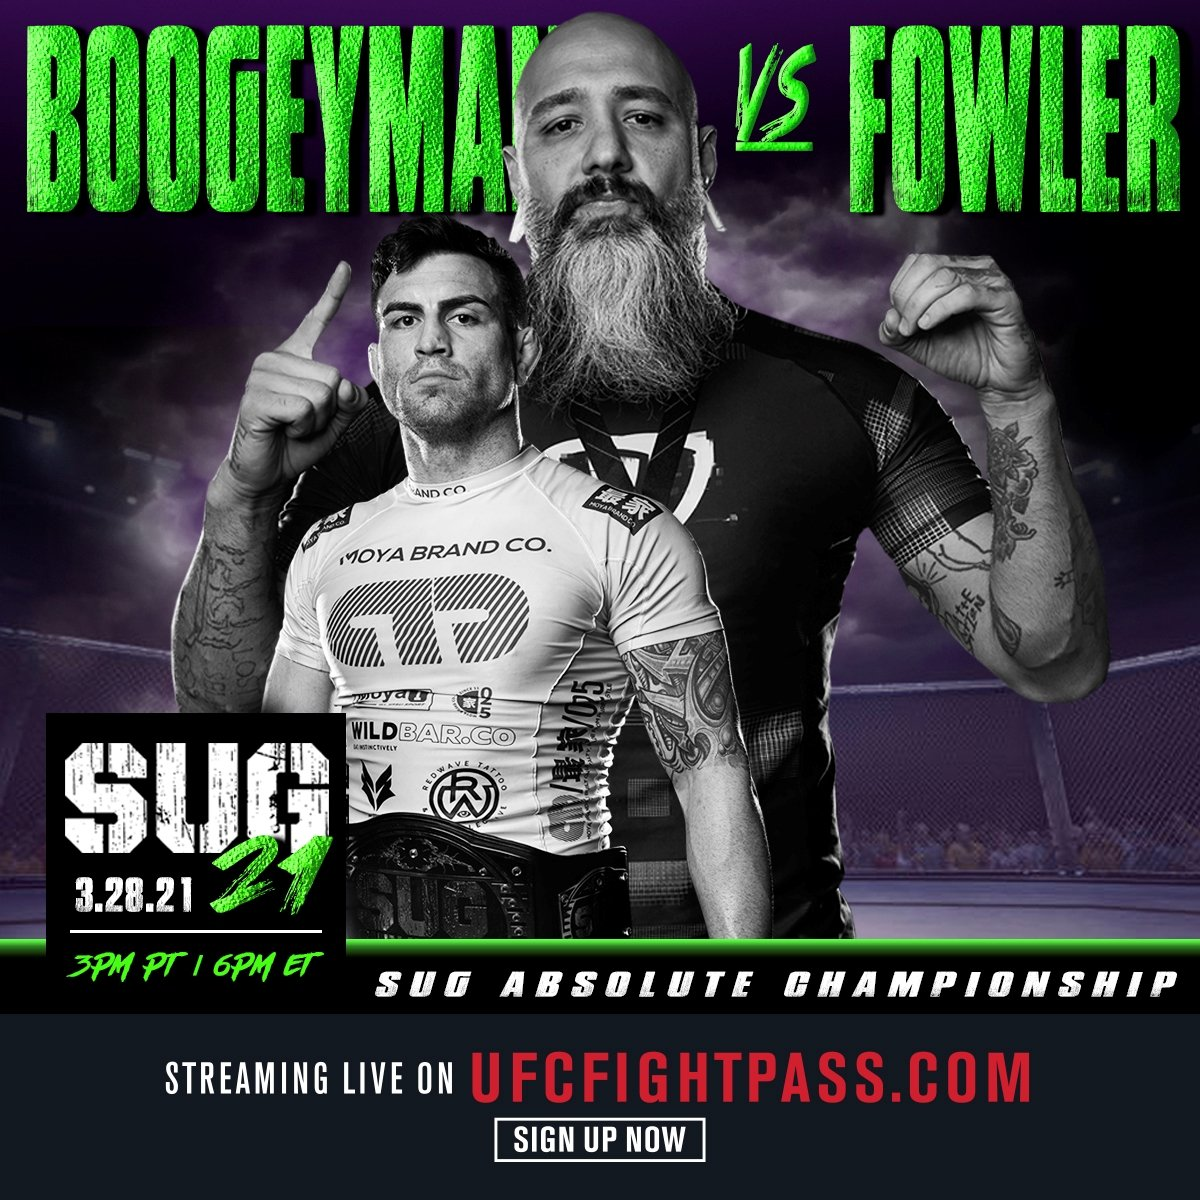 مسابقات گراپلینگ: Submission Underground 21: Fowler vs. Martinez